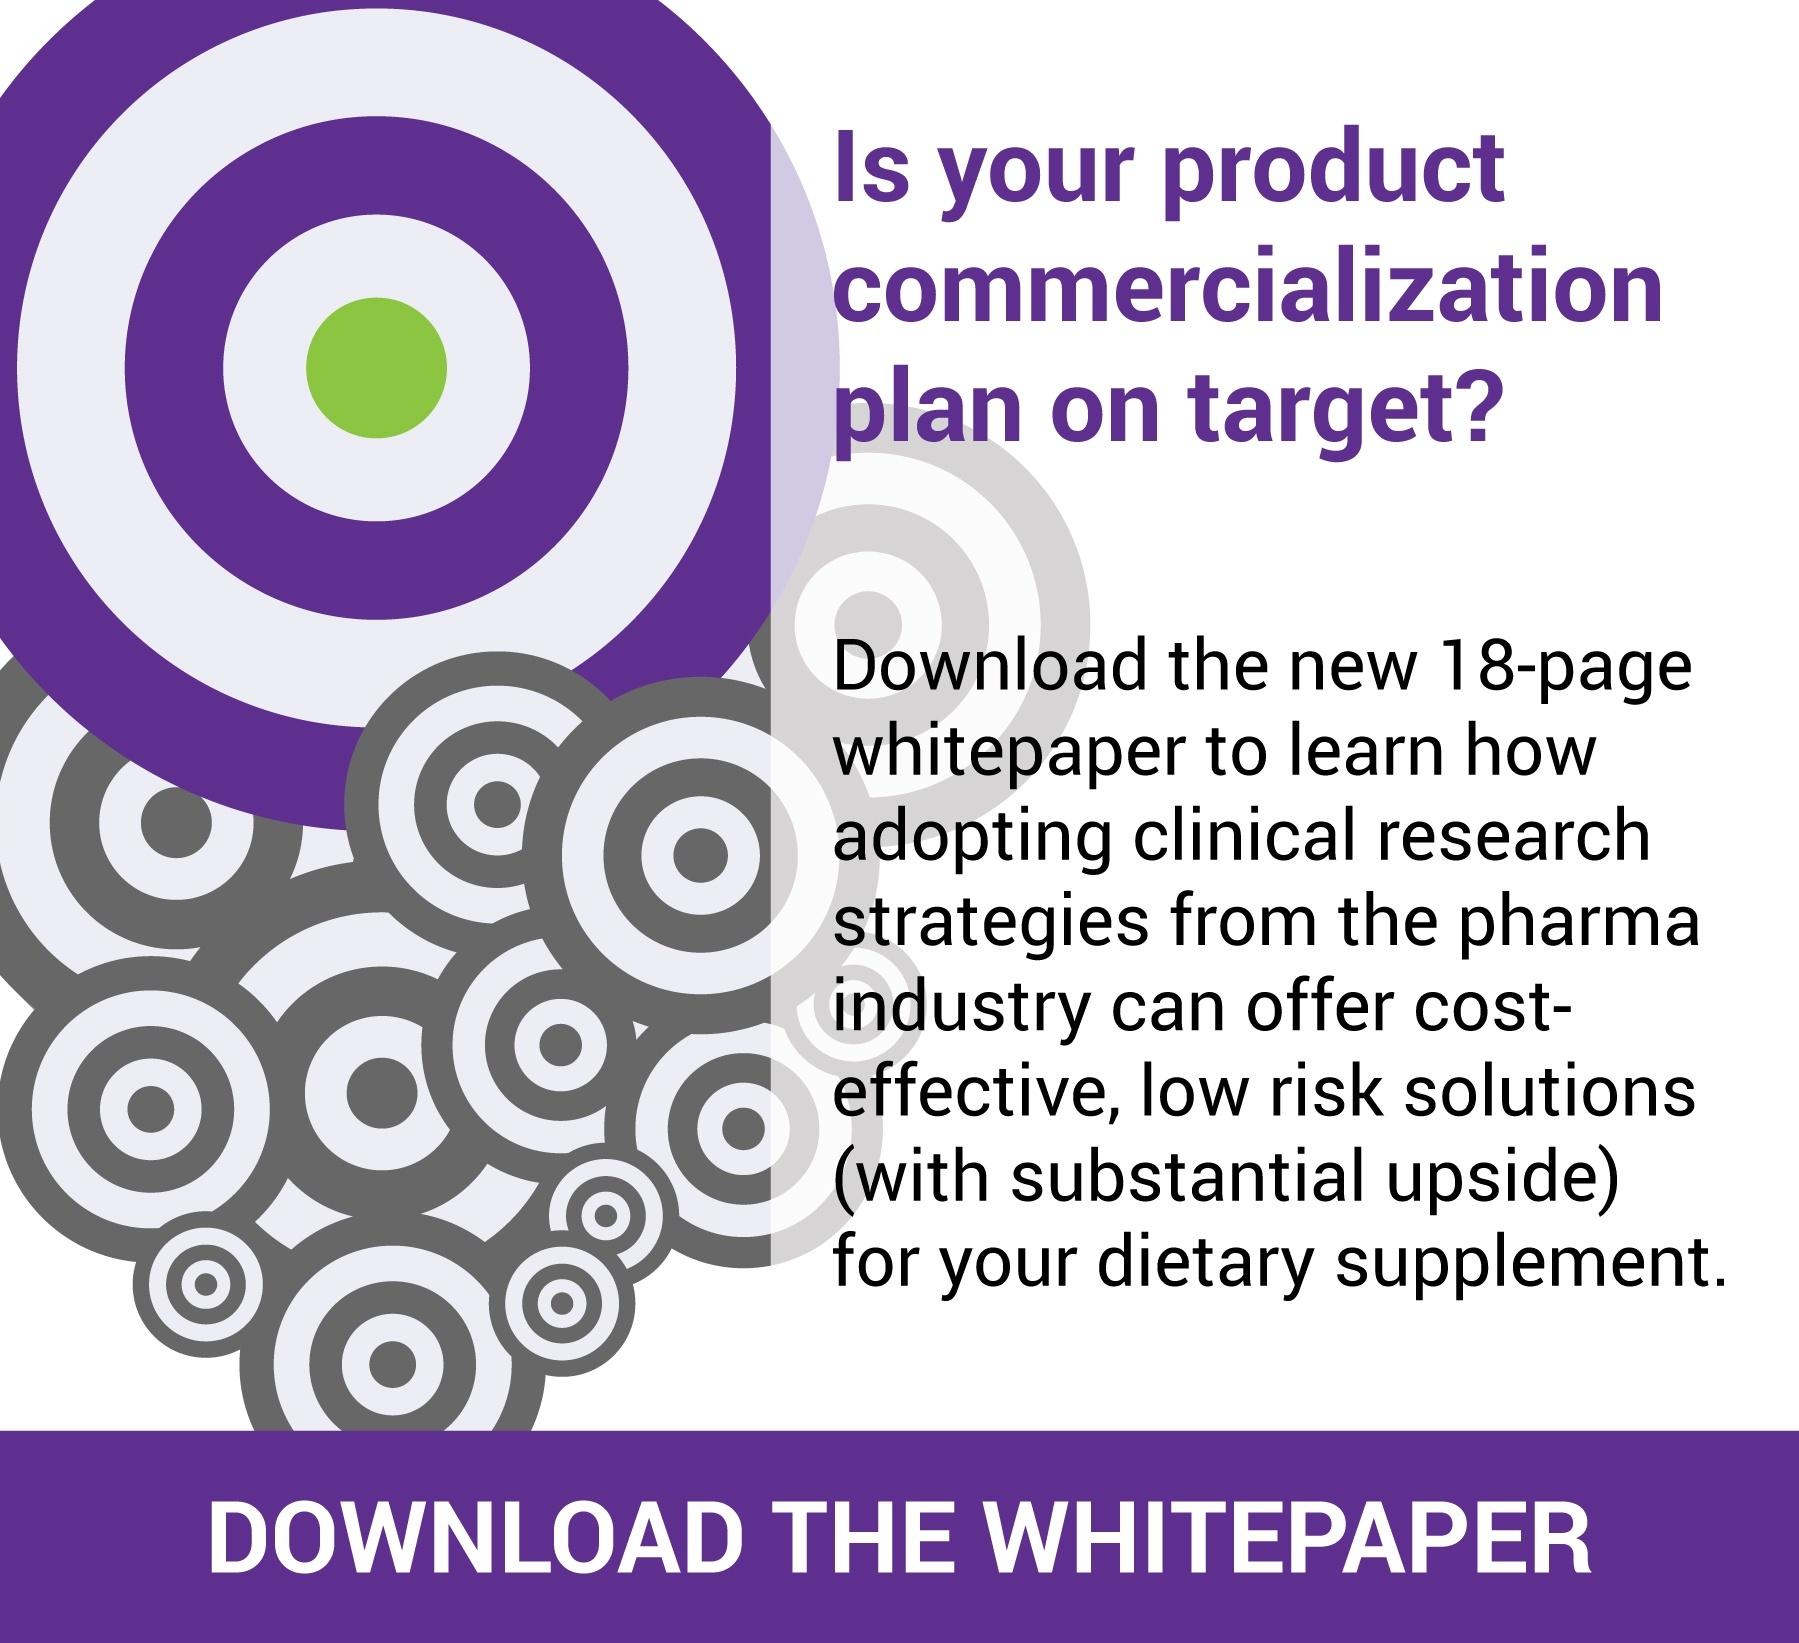 Dietary-supplement-commercialization-whitepaper-2015.jpg